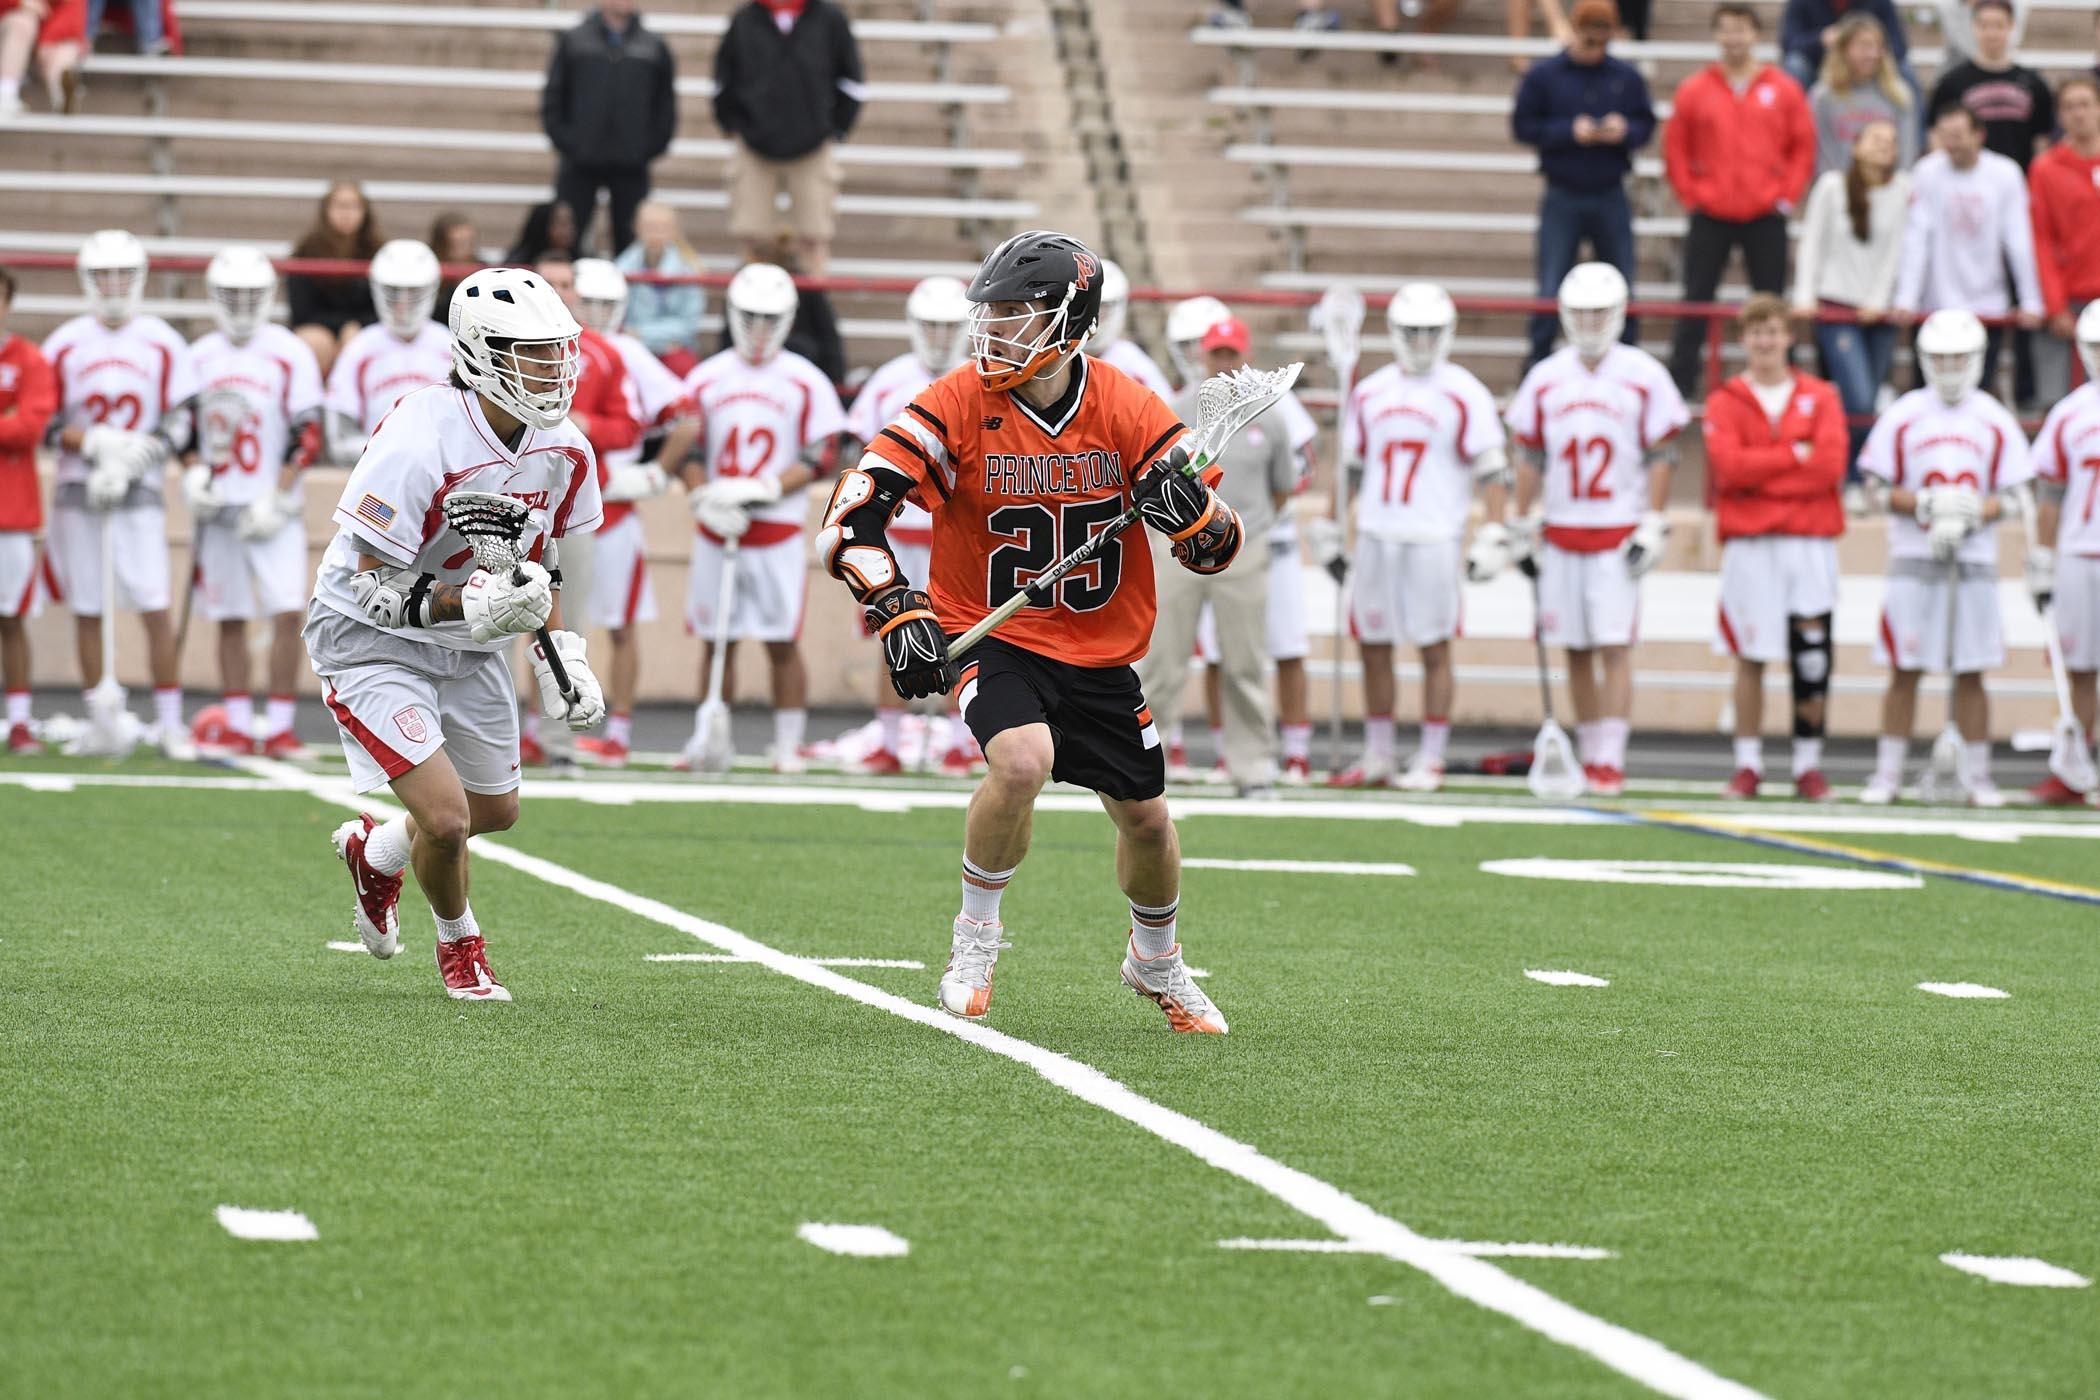 Zach Currier of the Princeton Tigers. (Photo credit: Robert Goldstein)